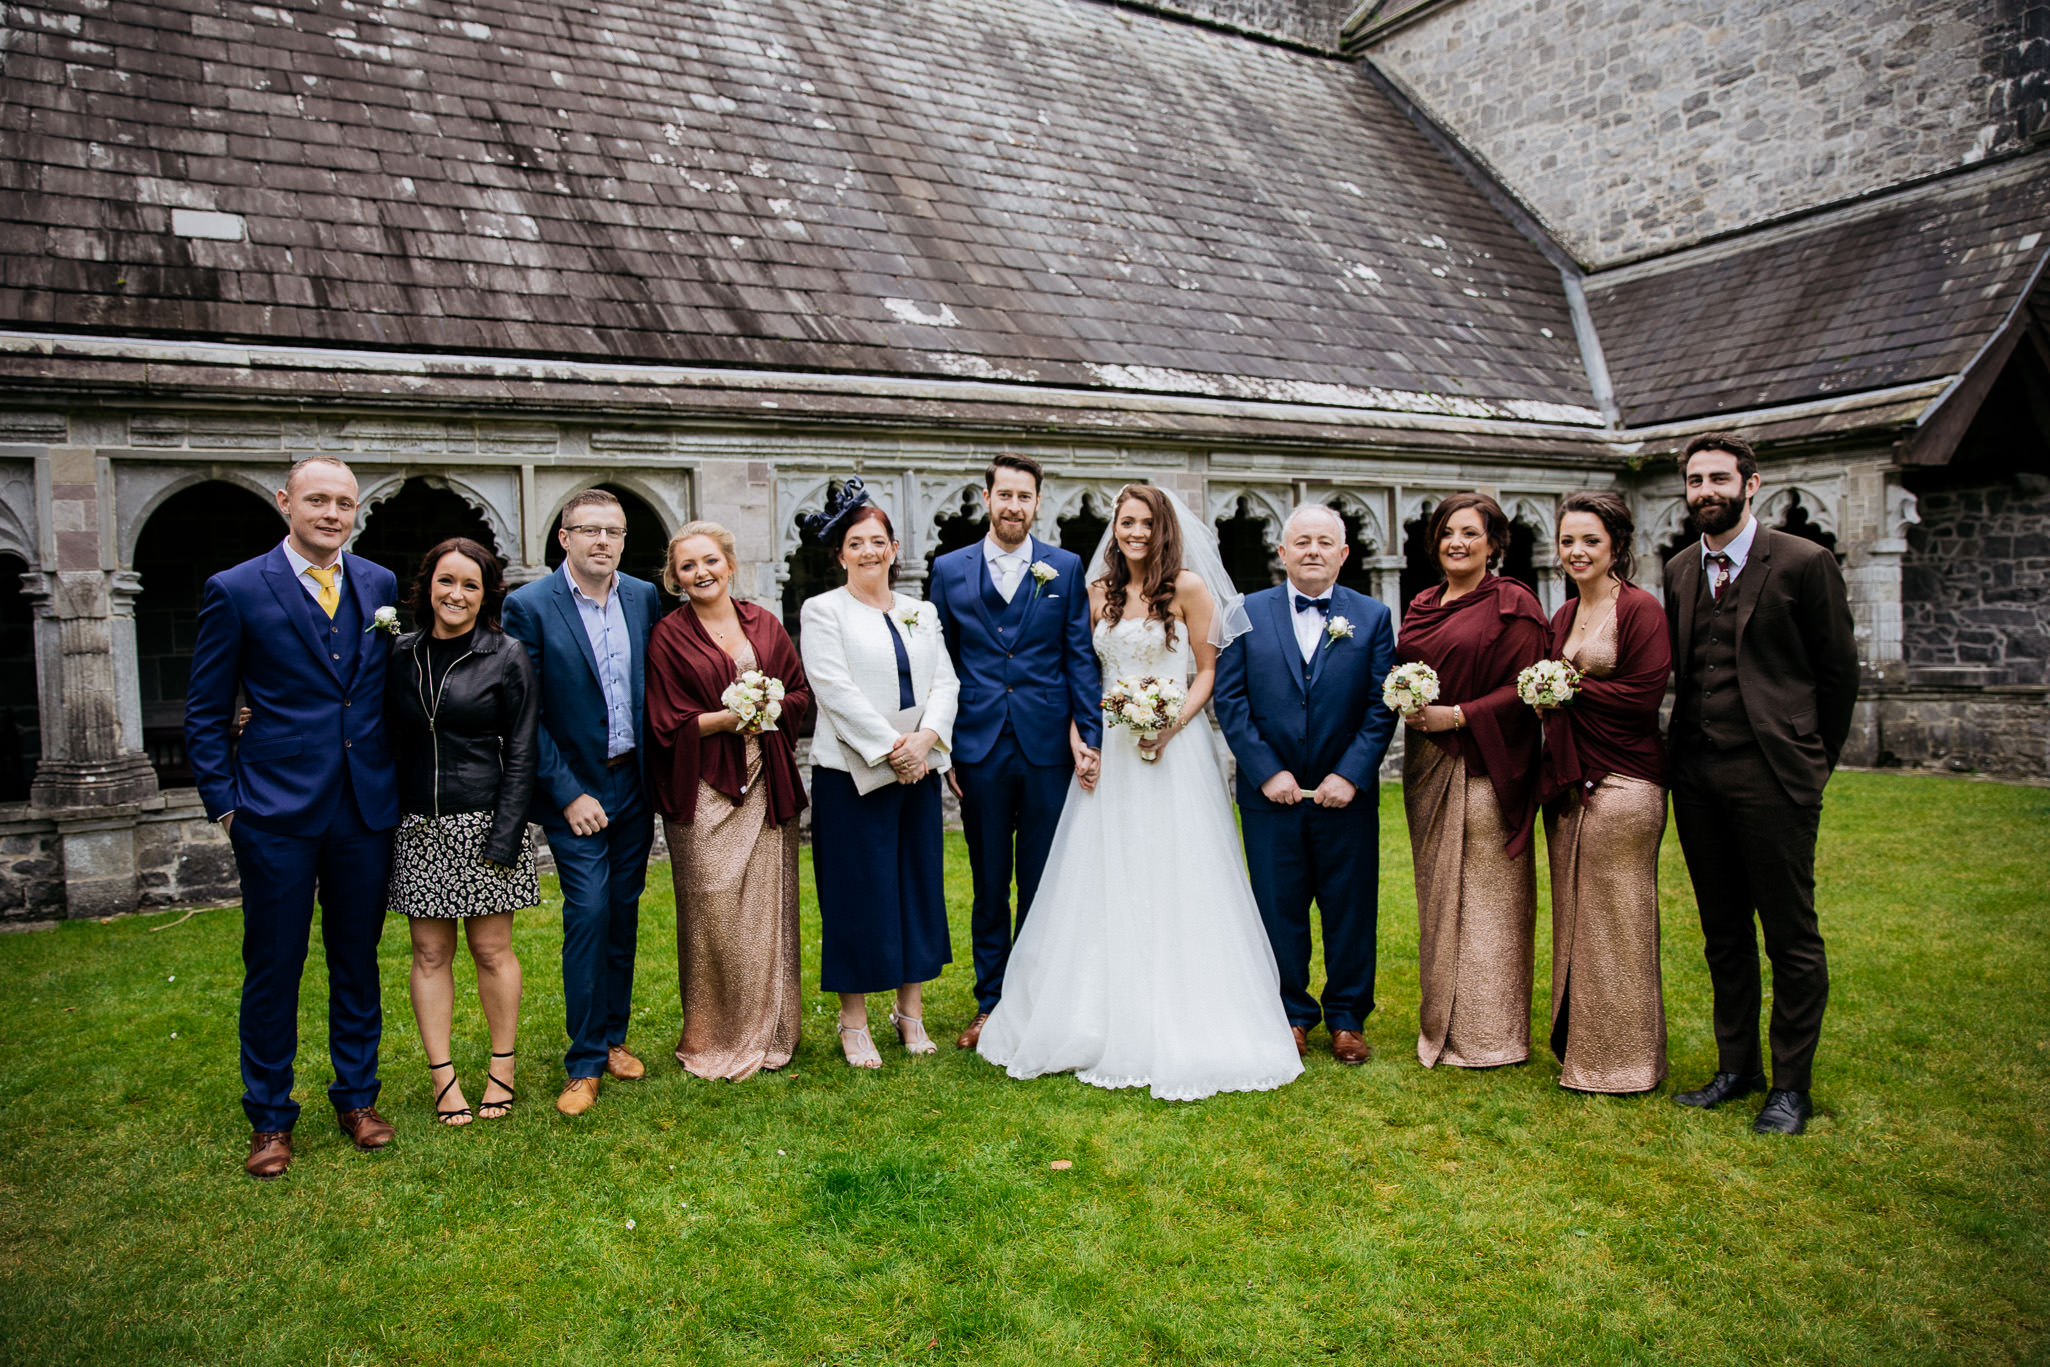 clairebyrnephotography-wedding-night-sparklers-new-years-eve-denyce-leonard-11.jpg